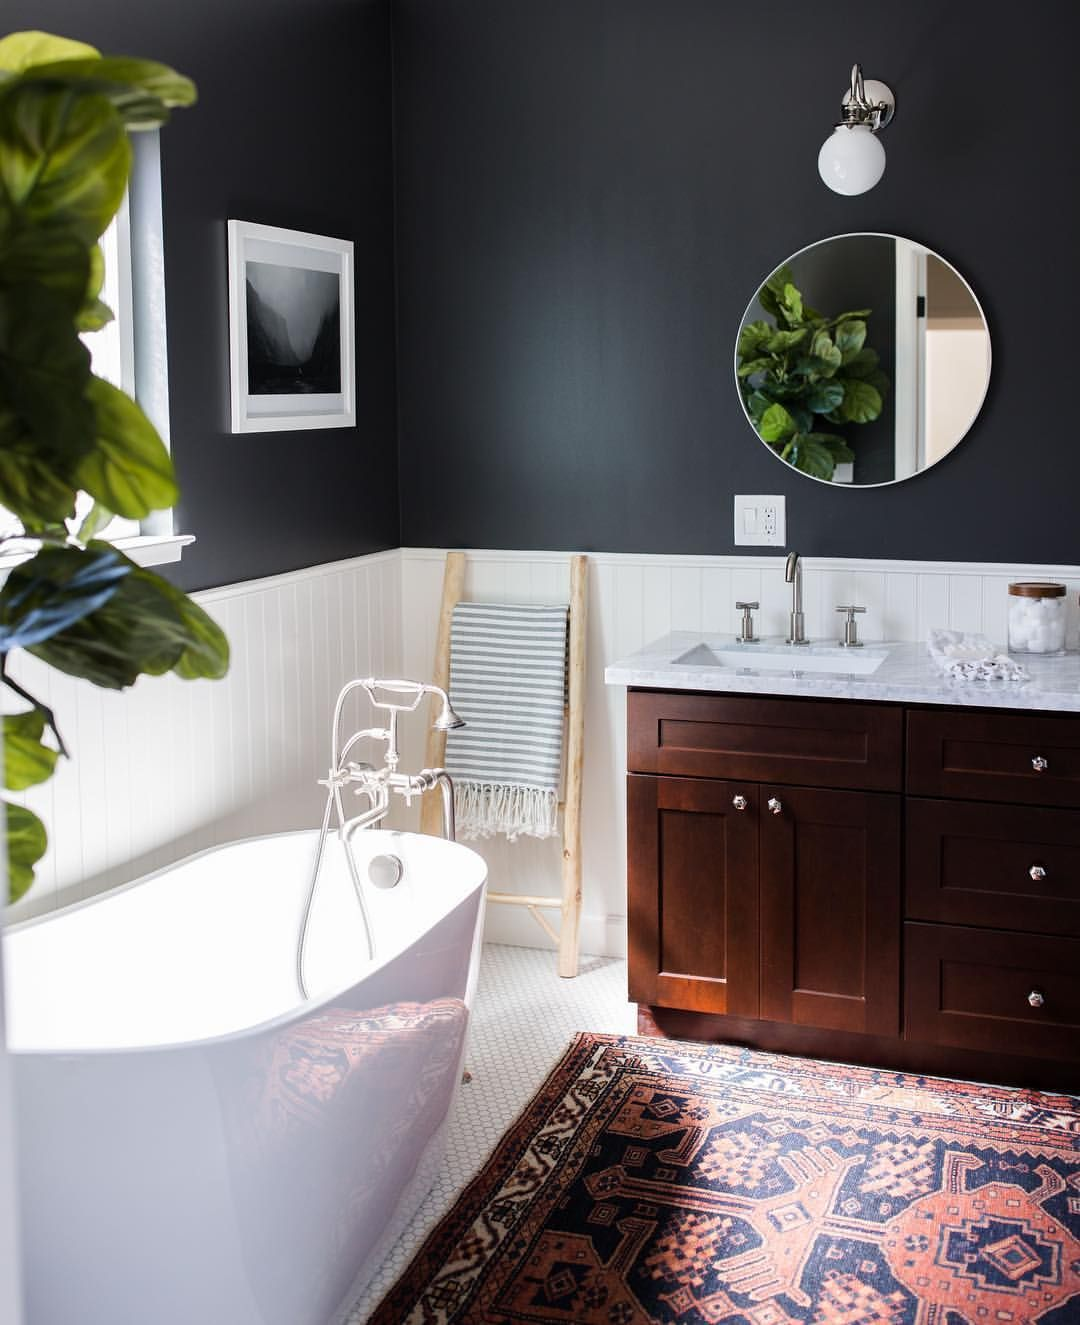 wooninspiratie-badkamer-tapijt-manman - Homestead   Pinterest - Badkamer